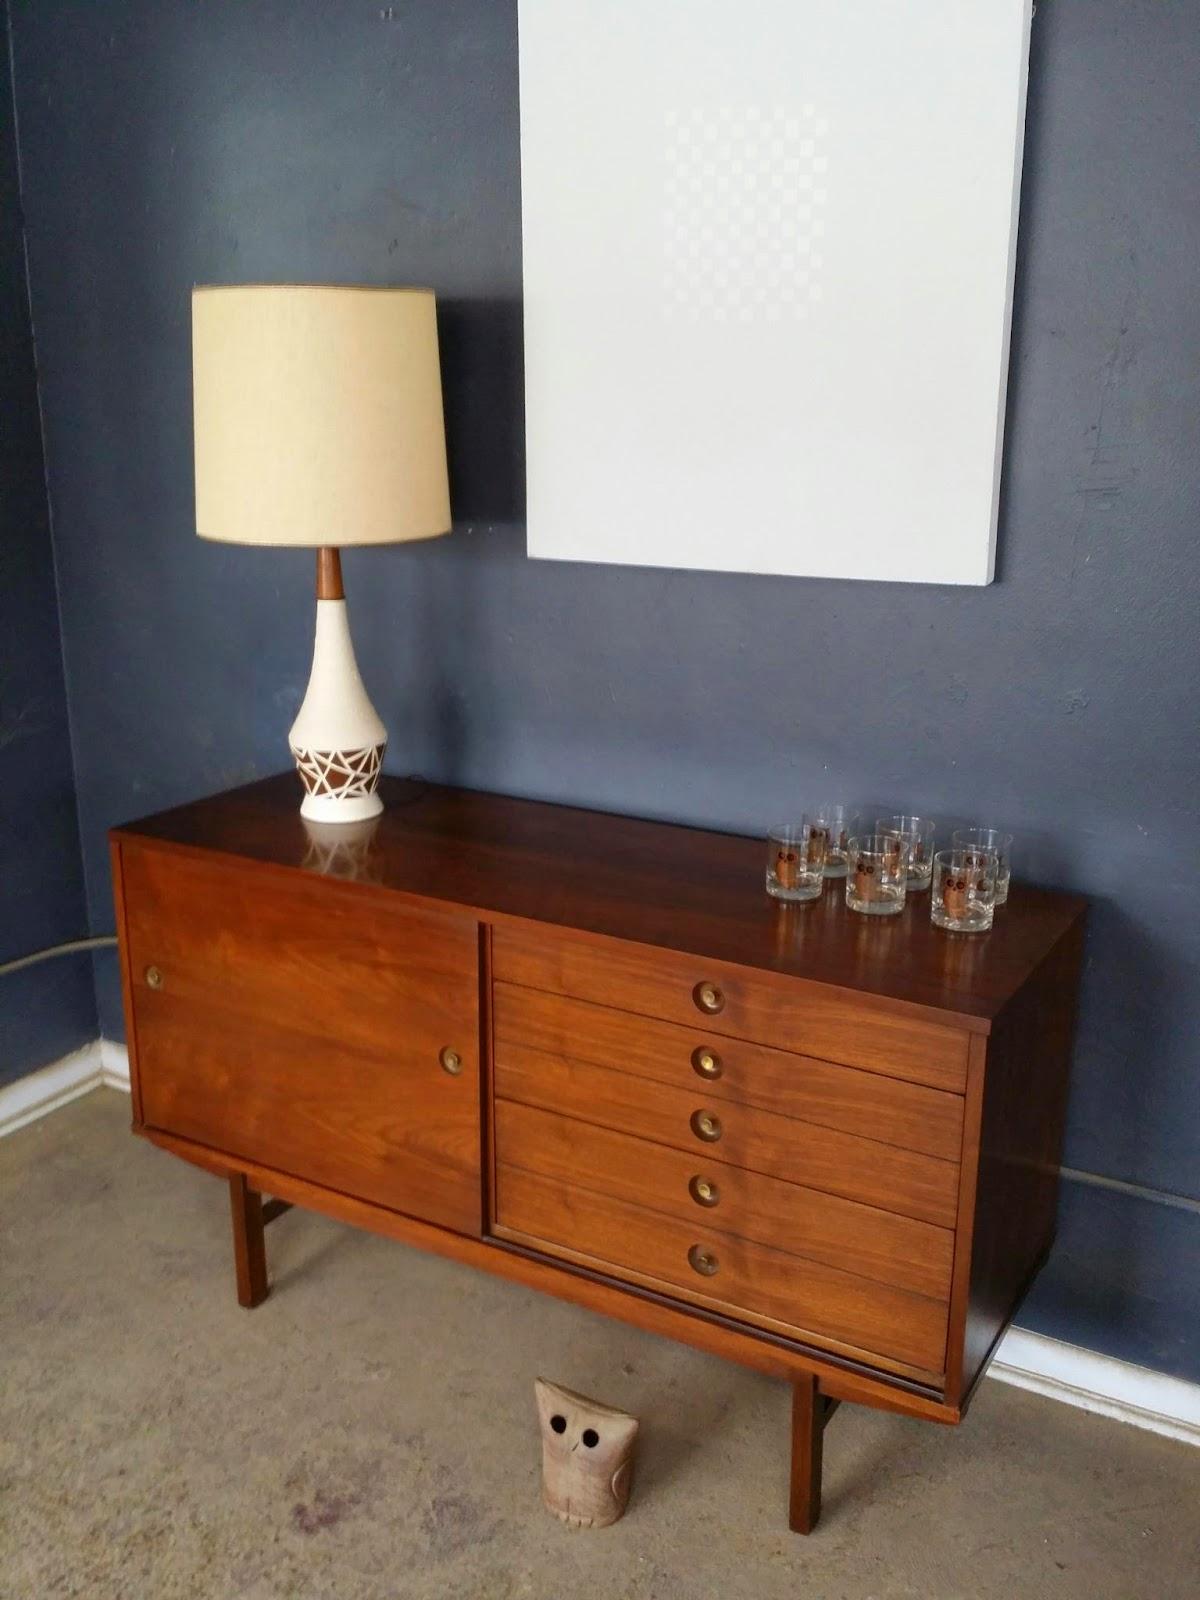 vintage ground mid century buffet sideboard media stand. Black Bedroom Furniture Sets. Home Design Ideas